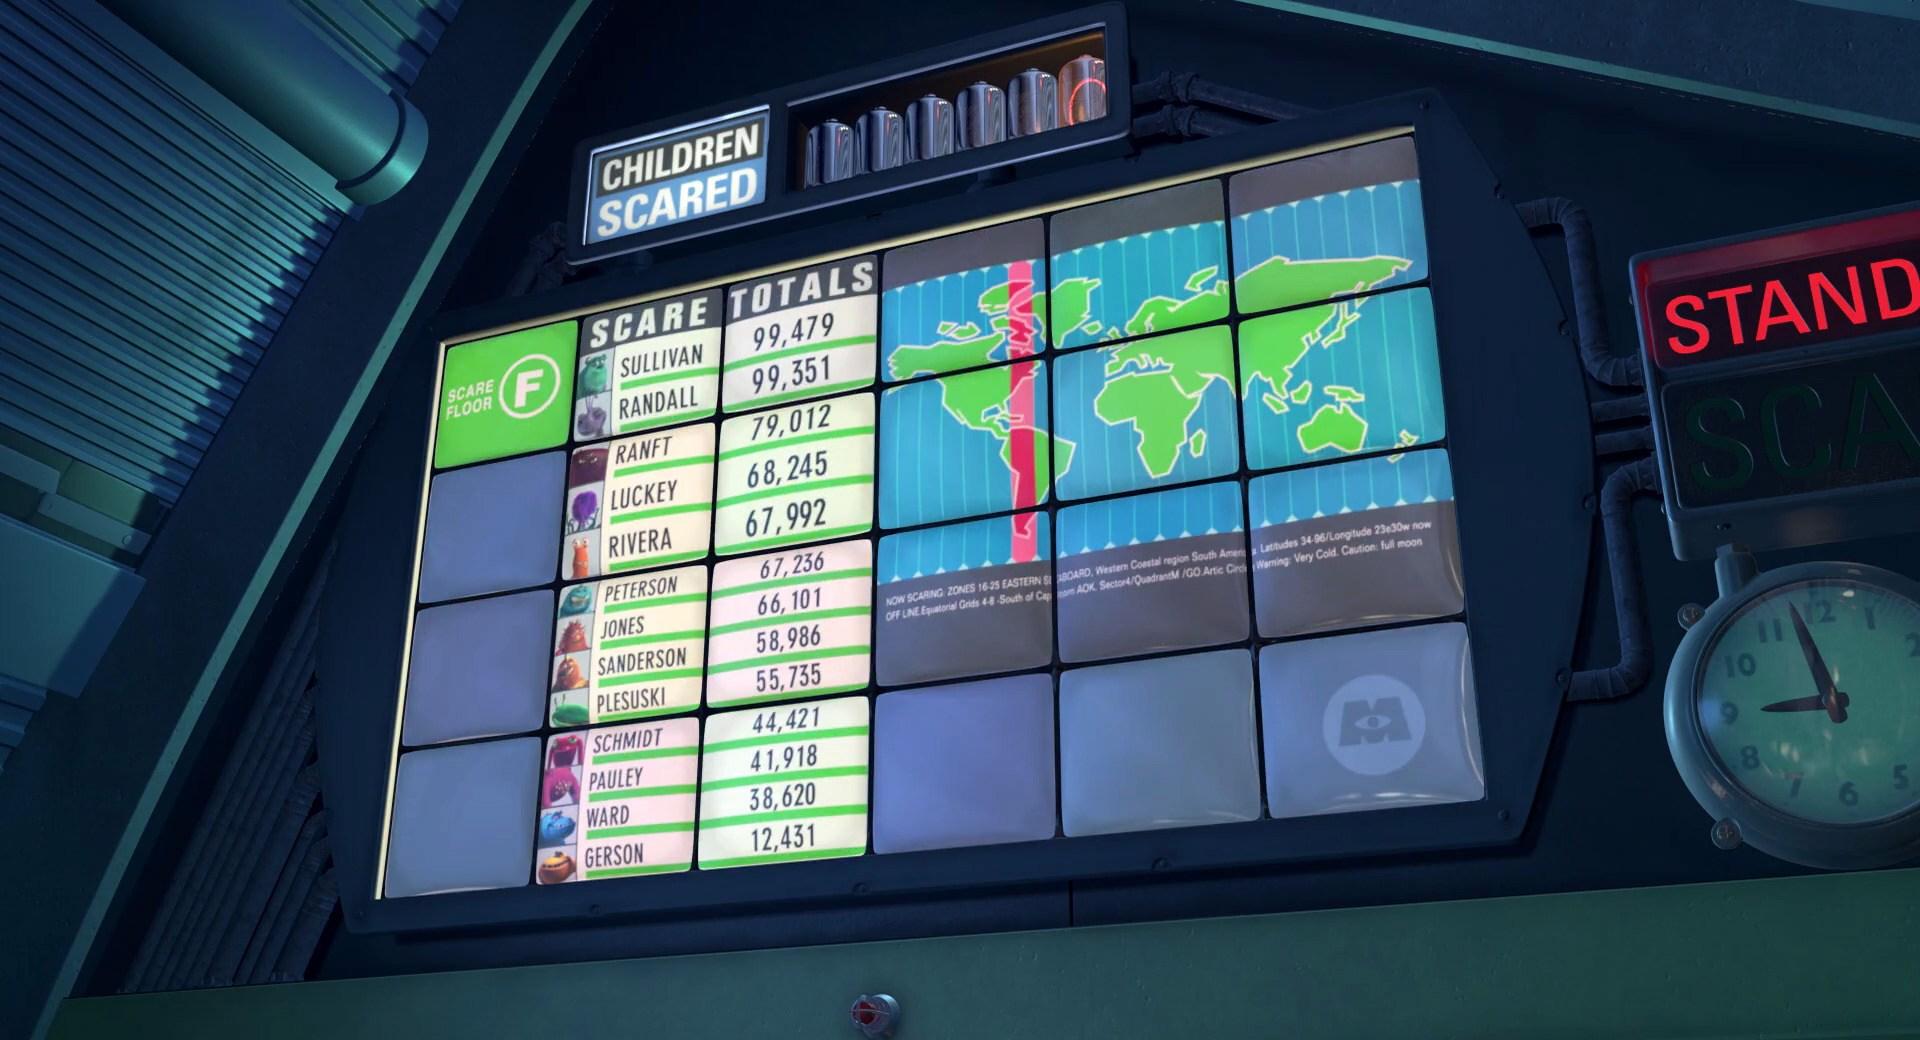 Scarer S Leaderboard Pixar Wiki Fandom Powered By Wikia